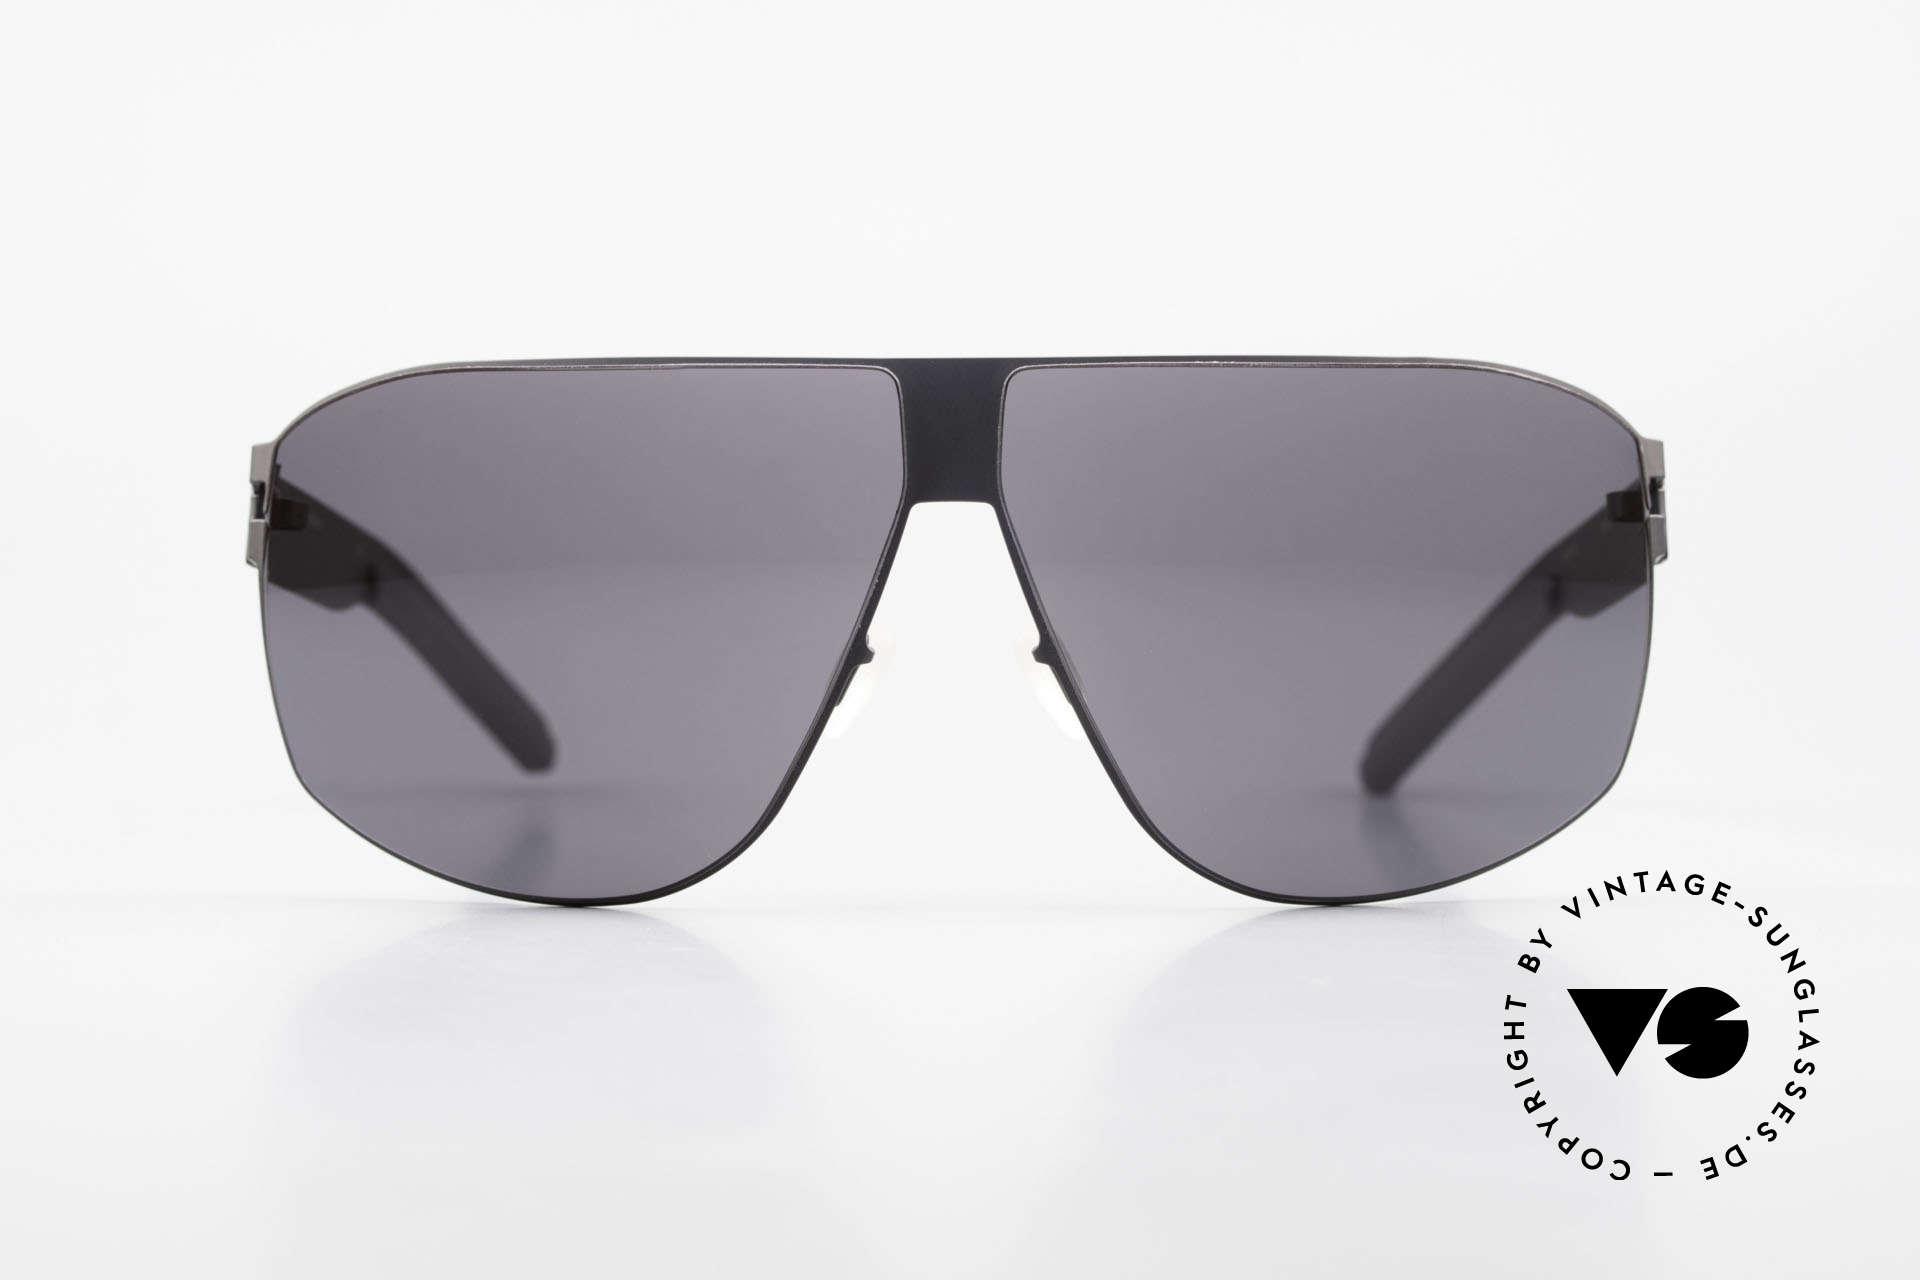 Mykita Terrence Vintage Mykita Sonnenbrille, Mykita: die jüngste Marke in unserem vintage Sortiment, Passend für Herren